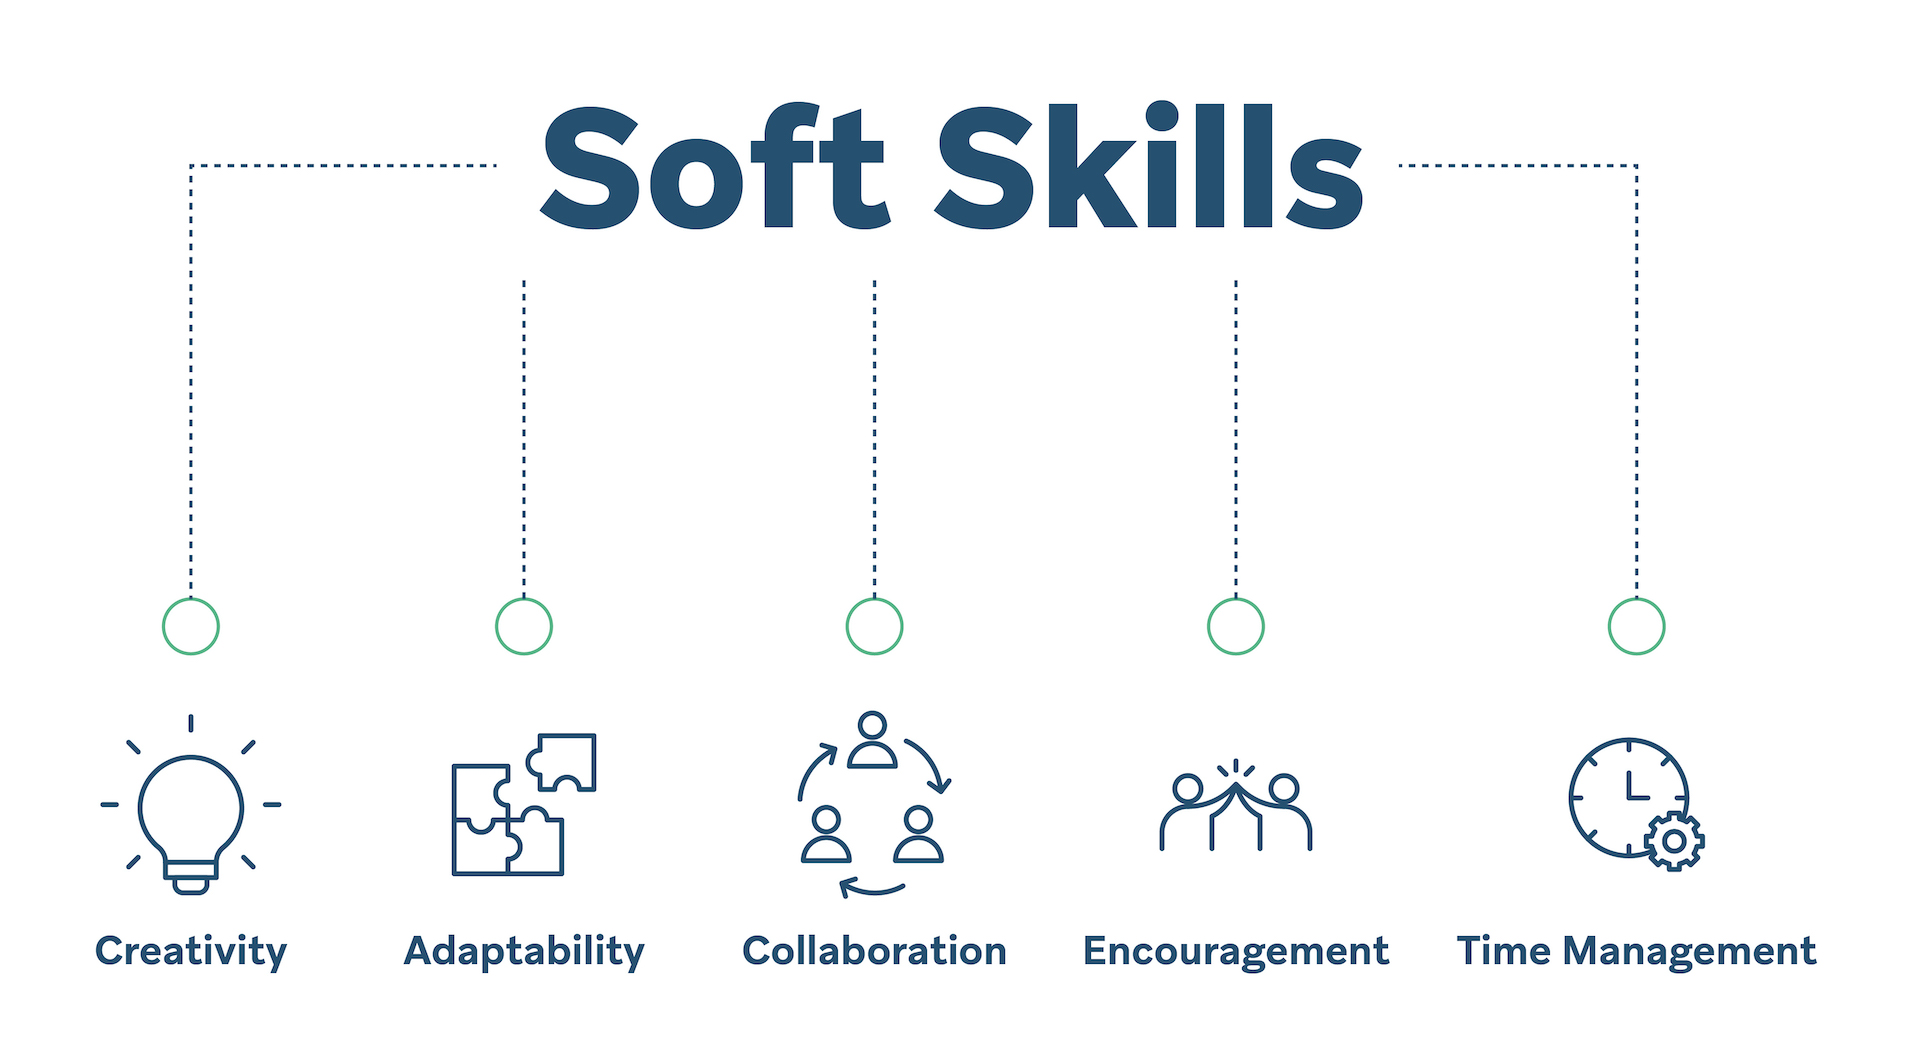 5 necessary soft skills